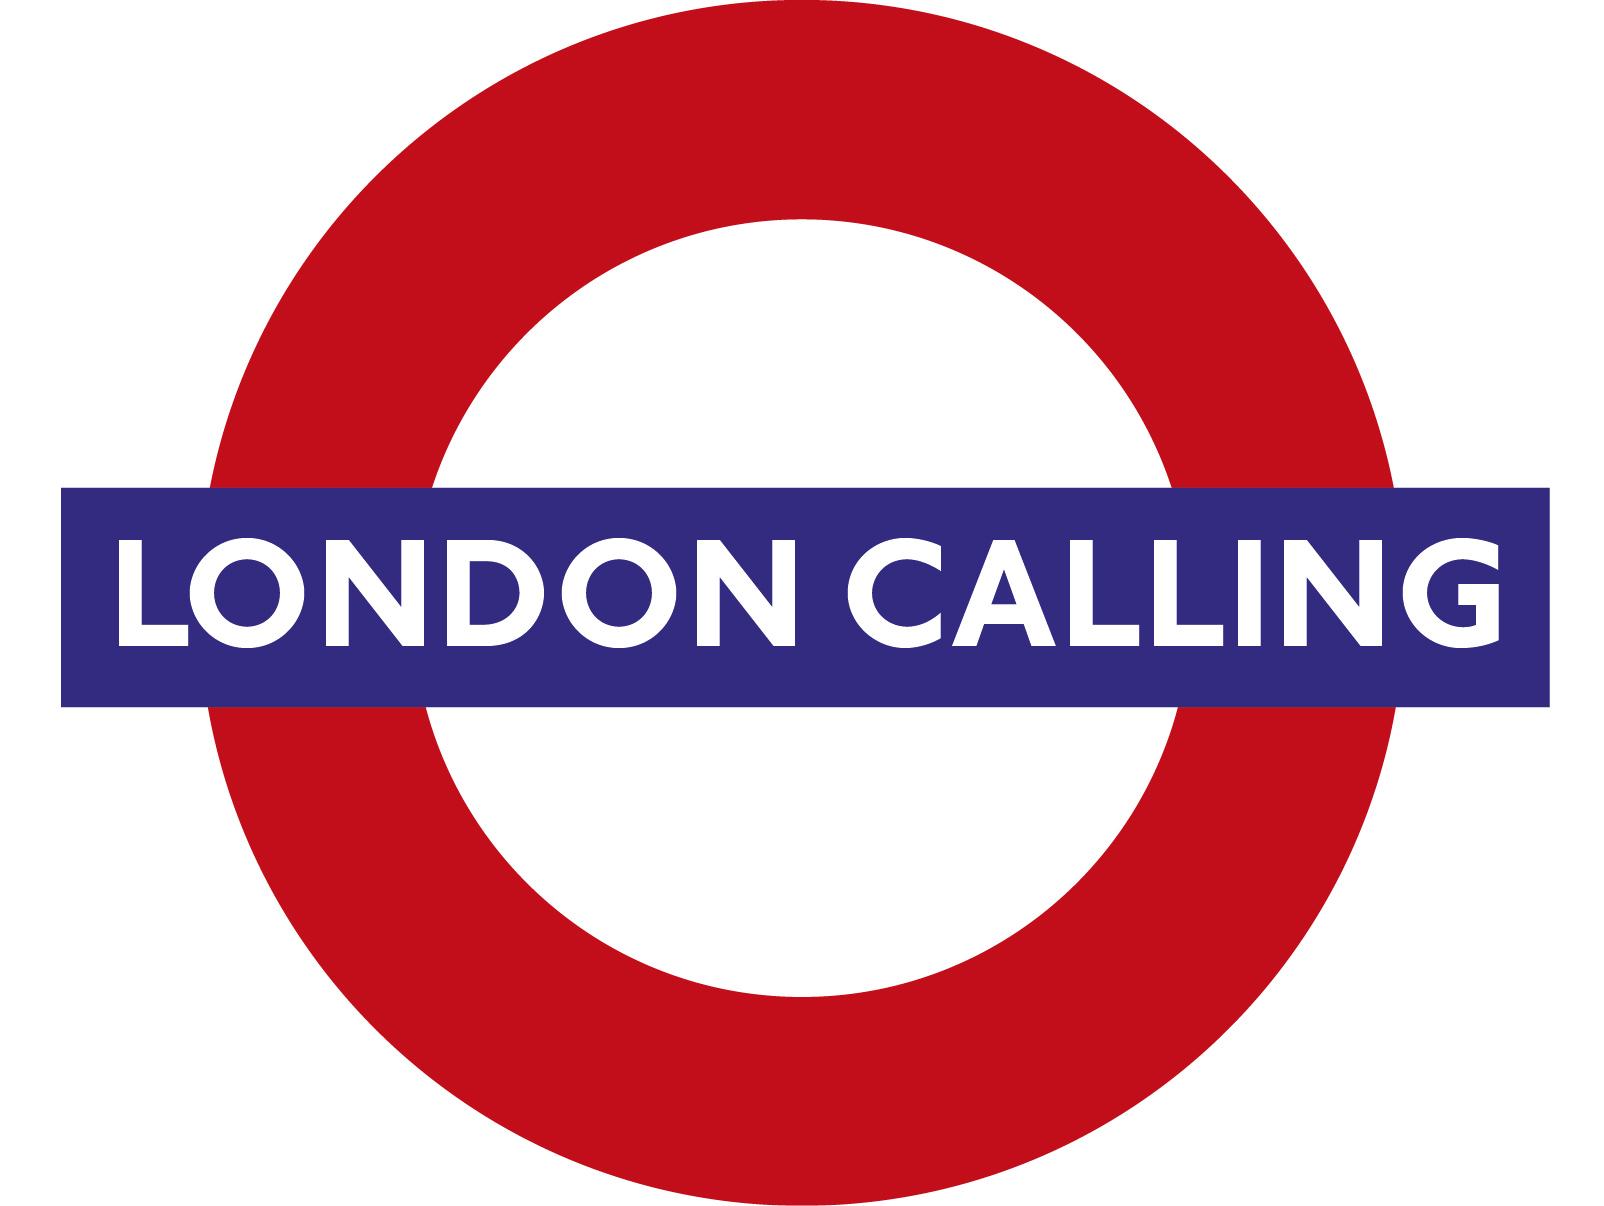 london_calling_logo.jpg